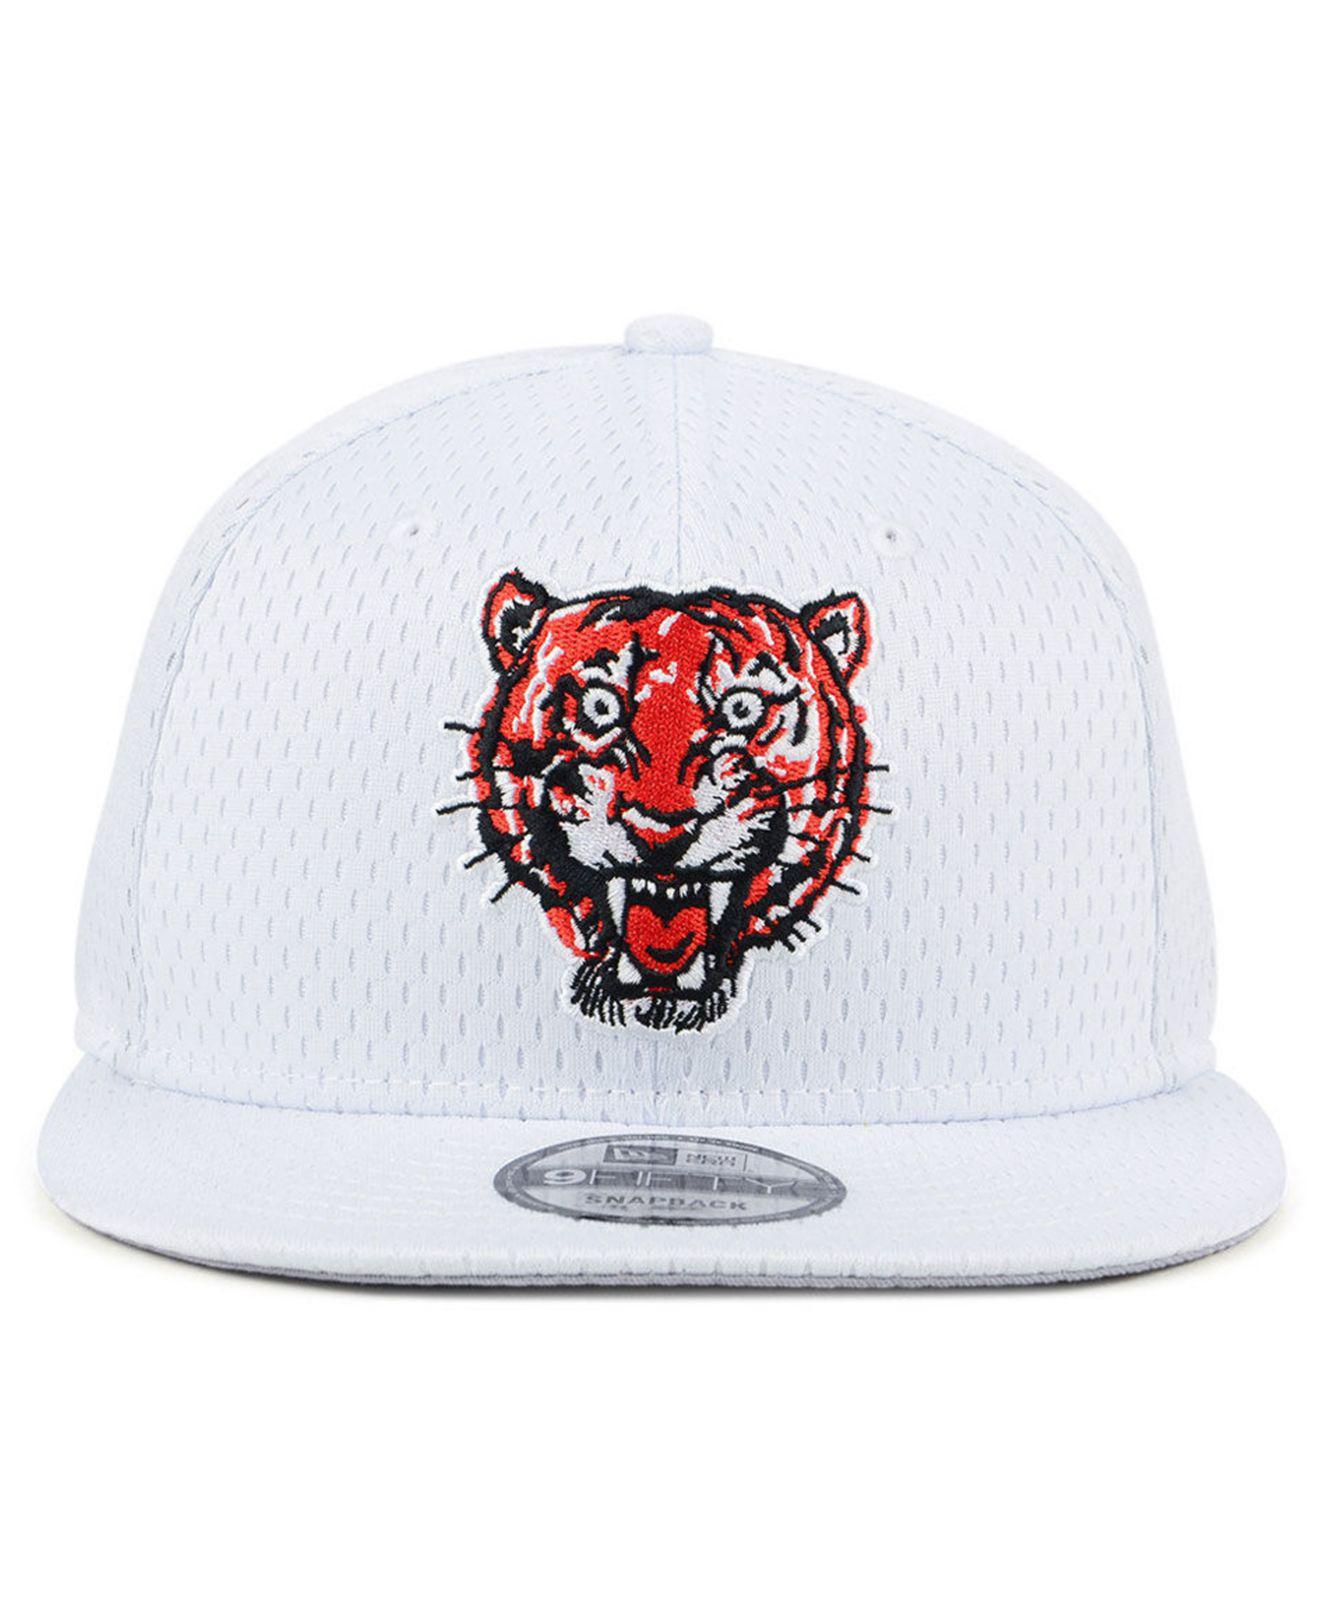 buy popular 2da3b 7693f ... clearance lyst ktz detroit tigers batting practice mesh 9fifty snapback  cap in white for men 95053